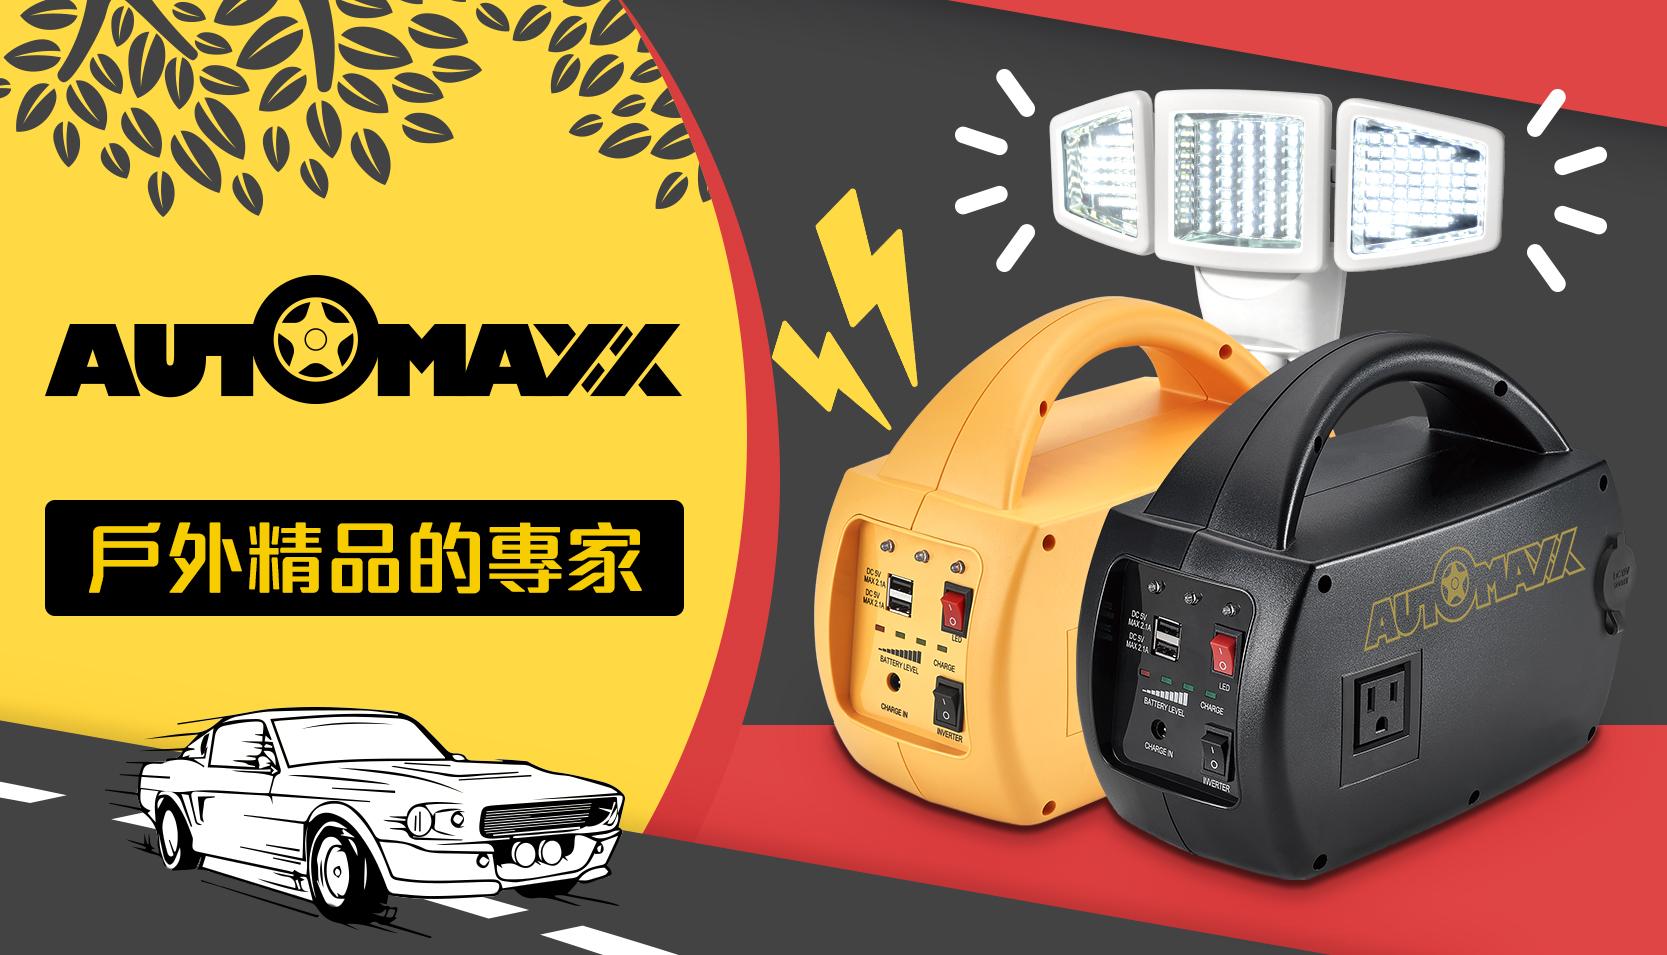 AUTOMAXX,行動電源,電煎鍋,露營,野餐